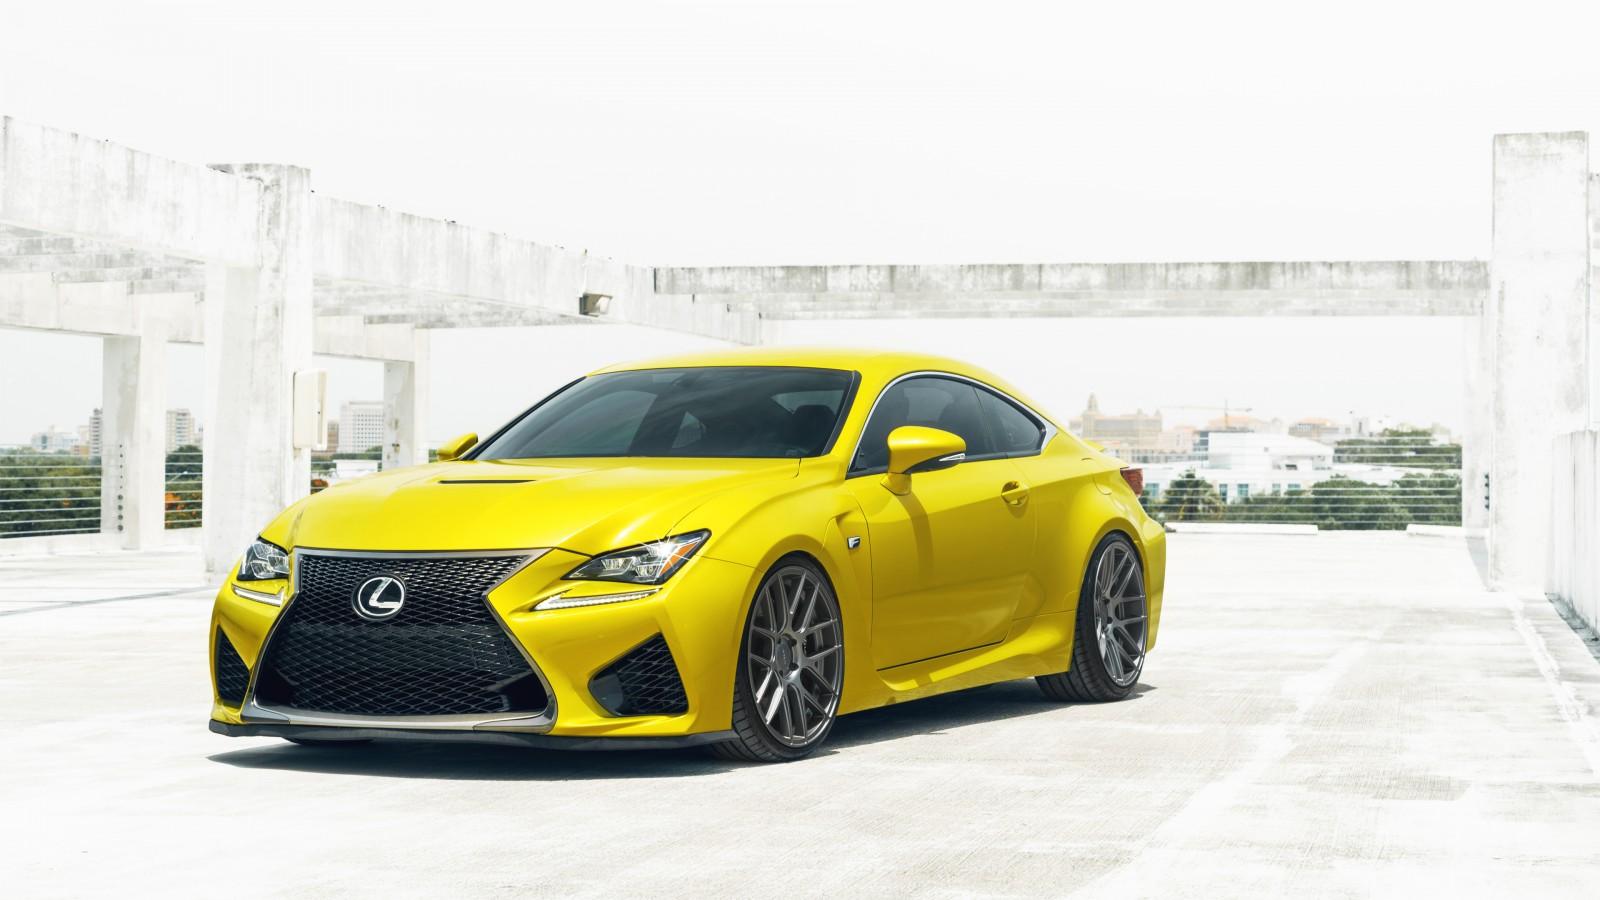 Yellow Lexus RCF Wallpaper | HD Car Wallpapers | ID #5588